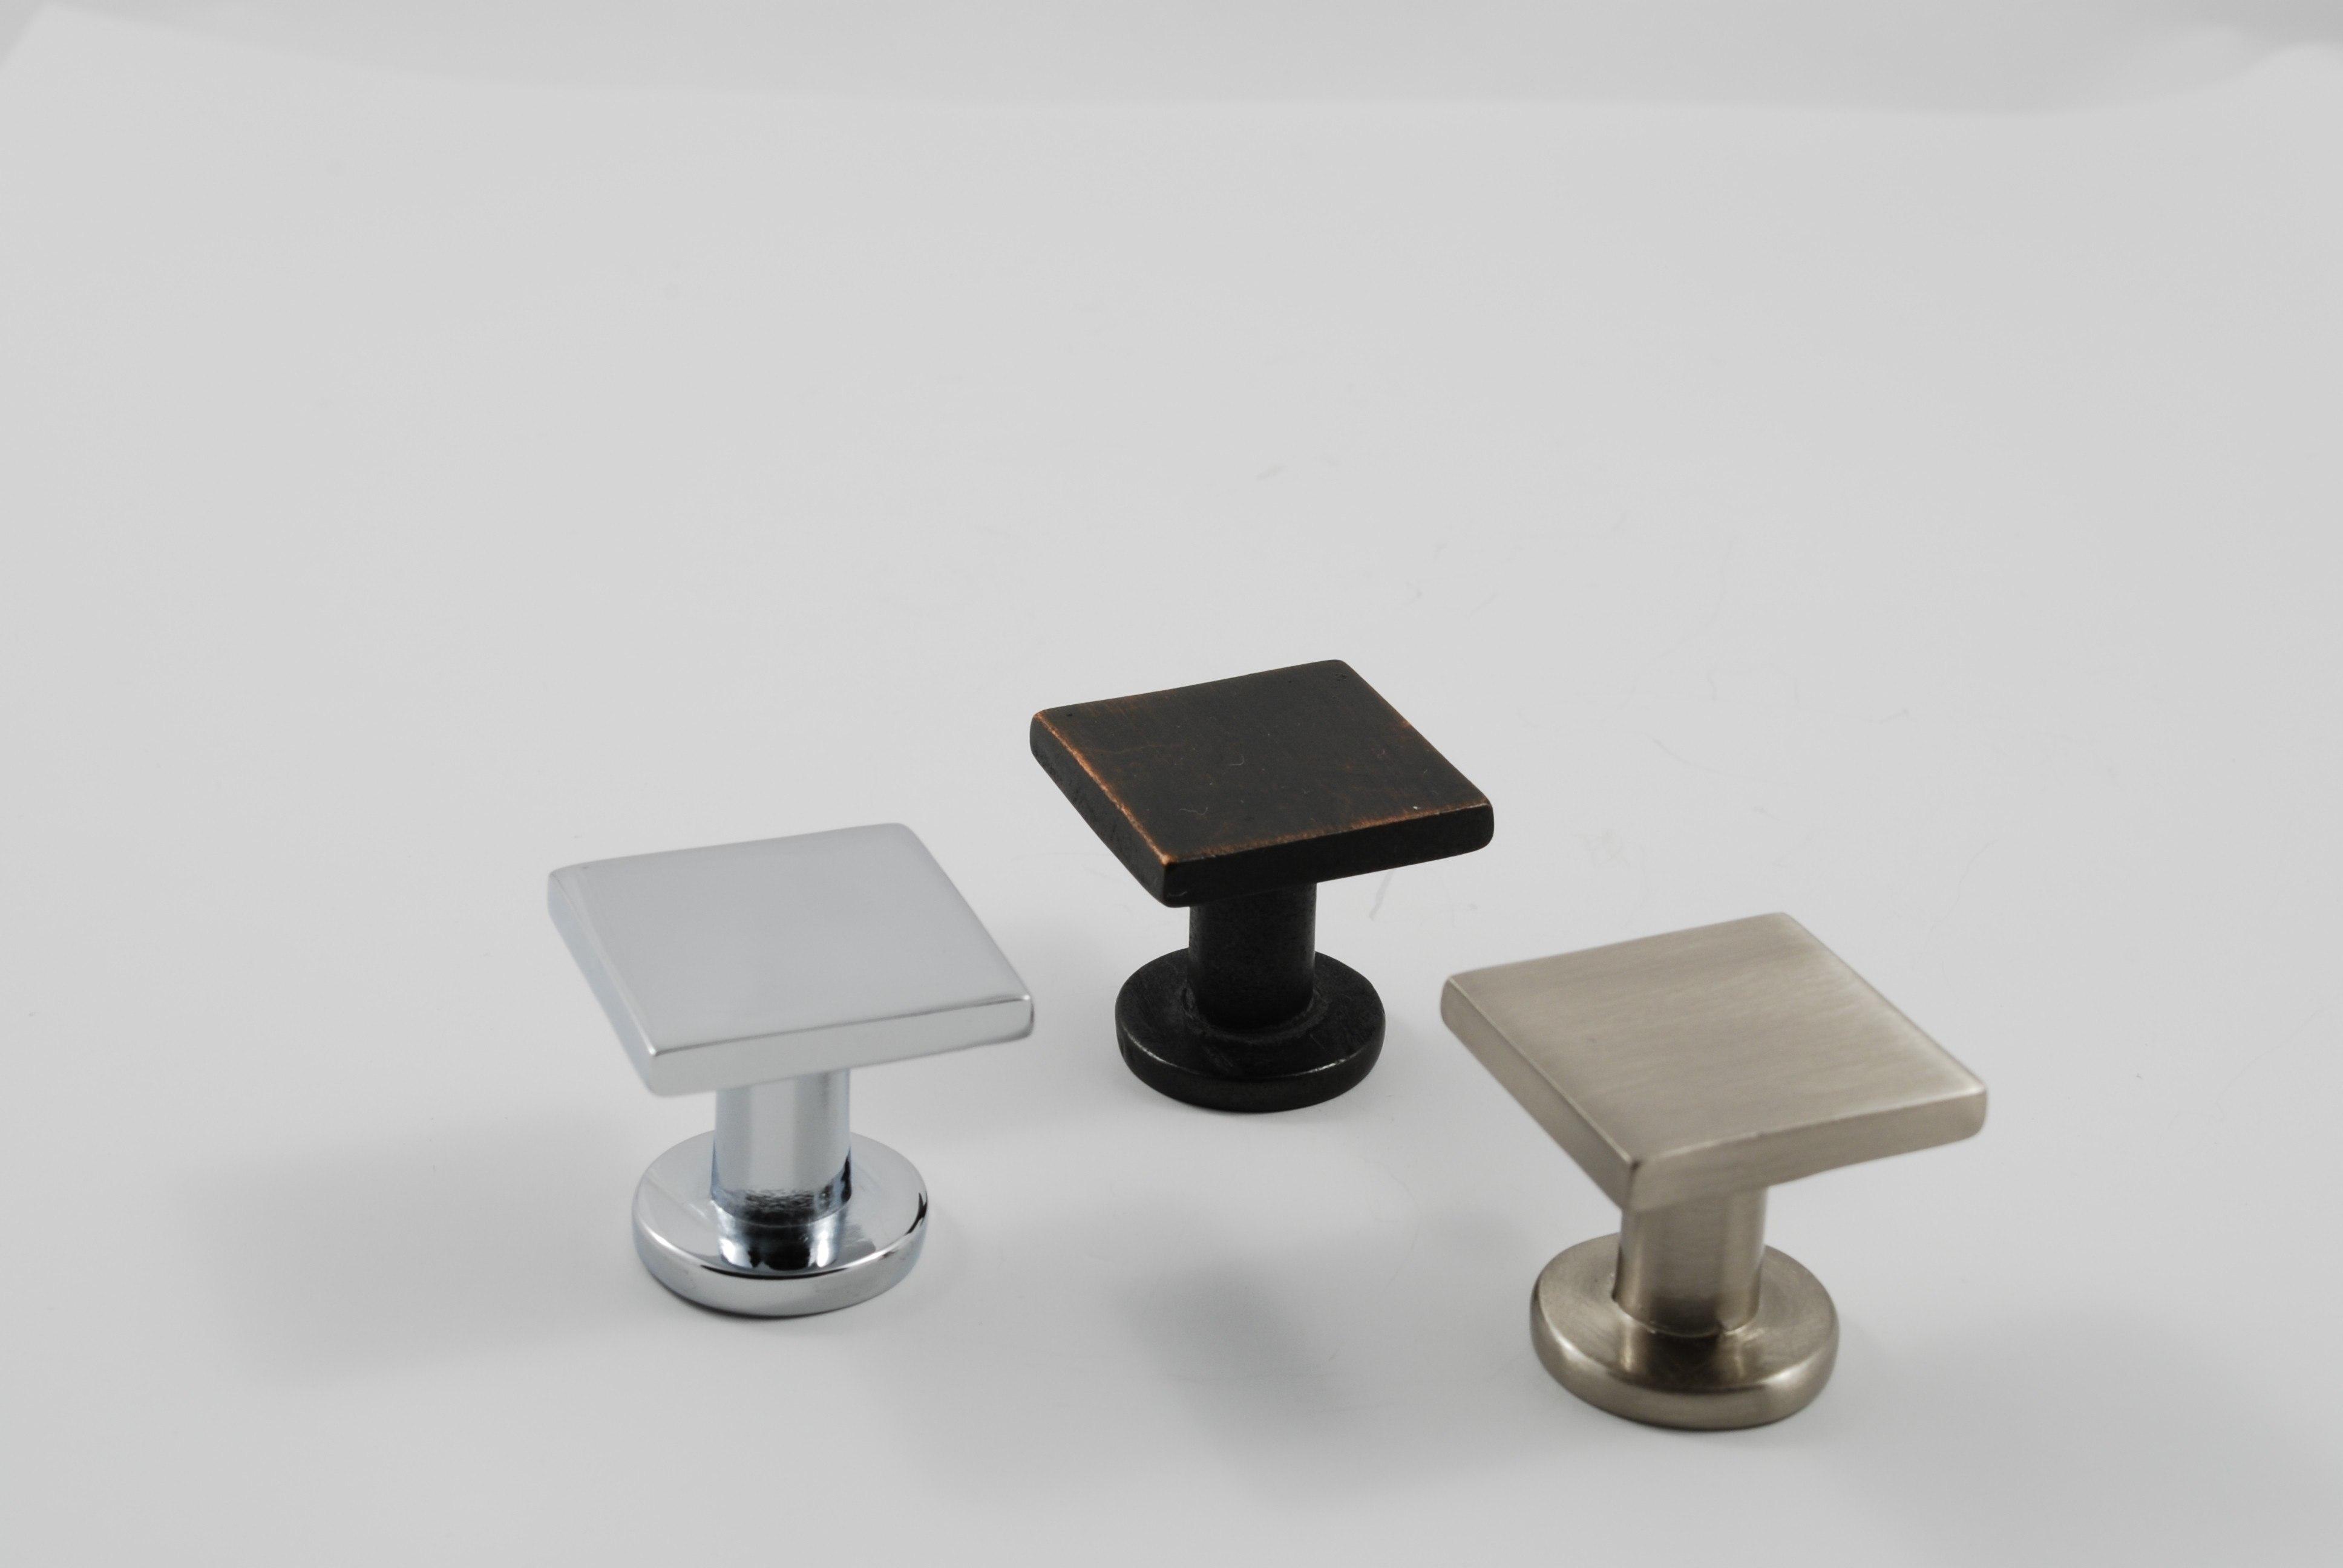 Residential Essentials 10320 Cabinet Knob